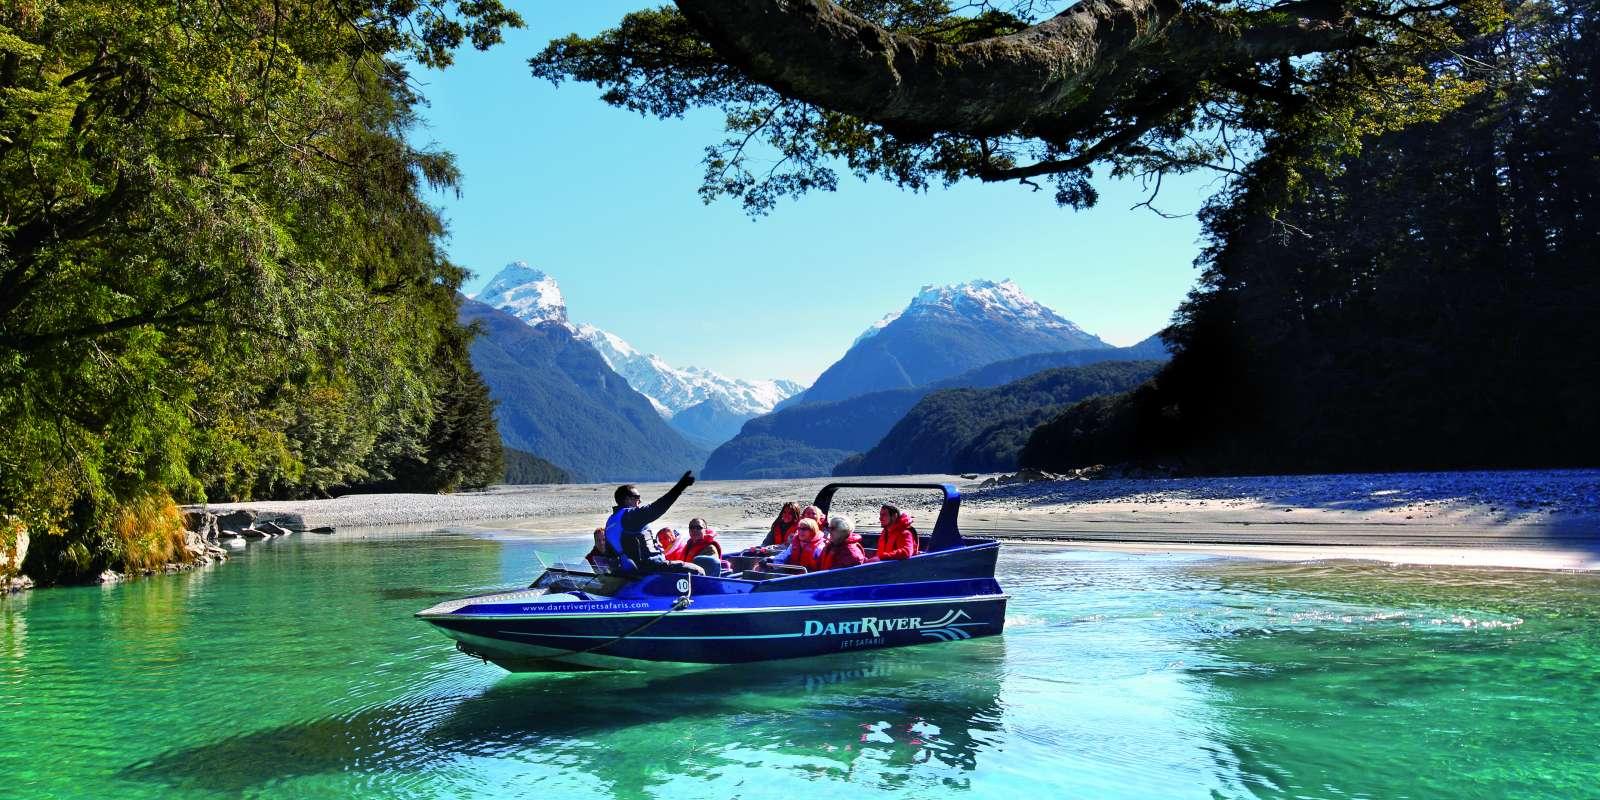 Dart River Jetboat